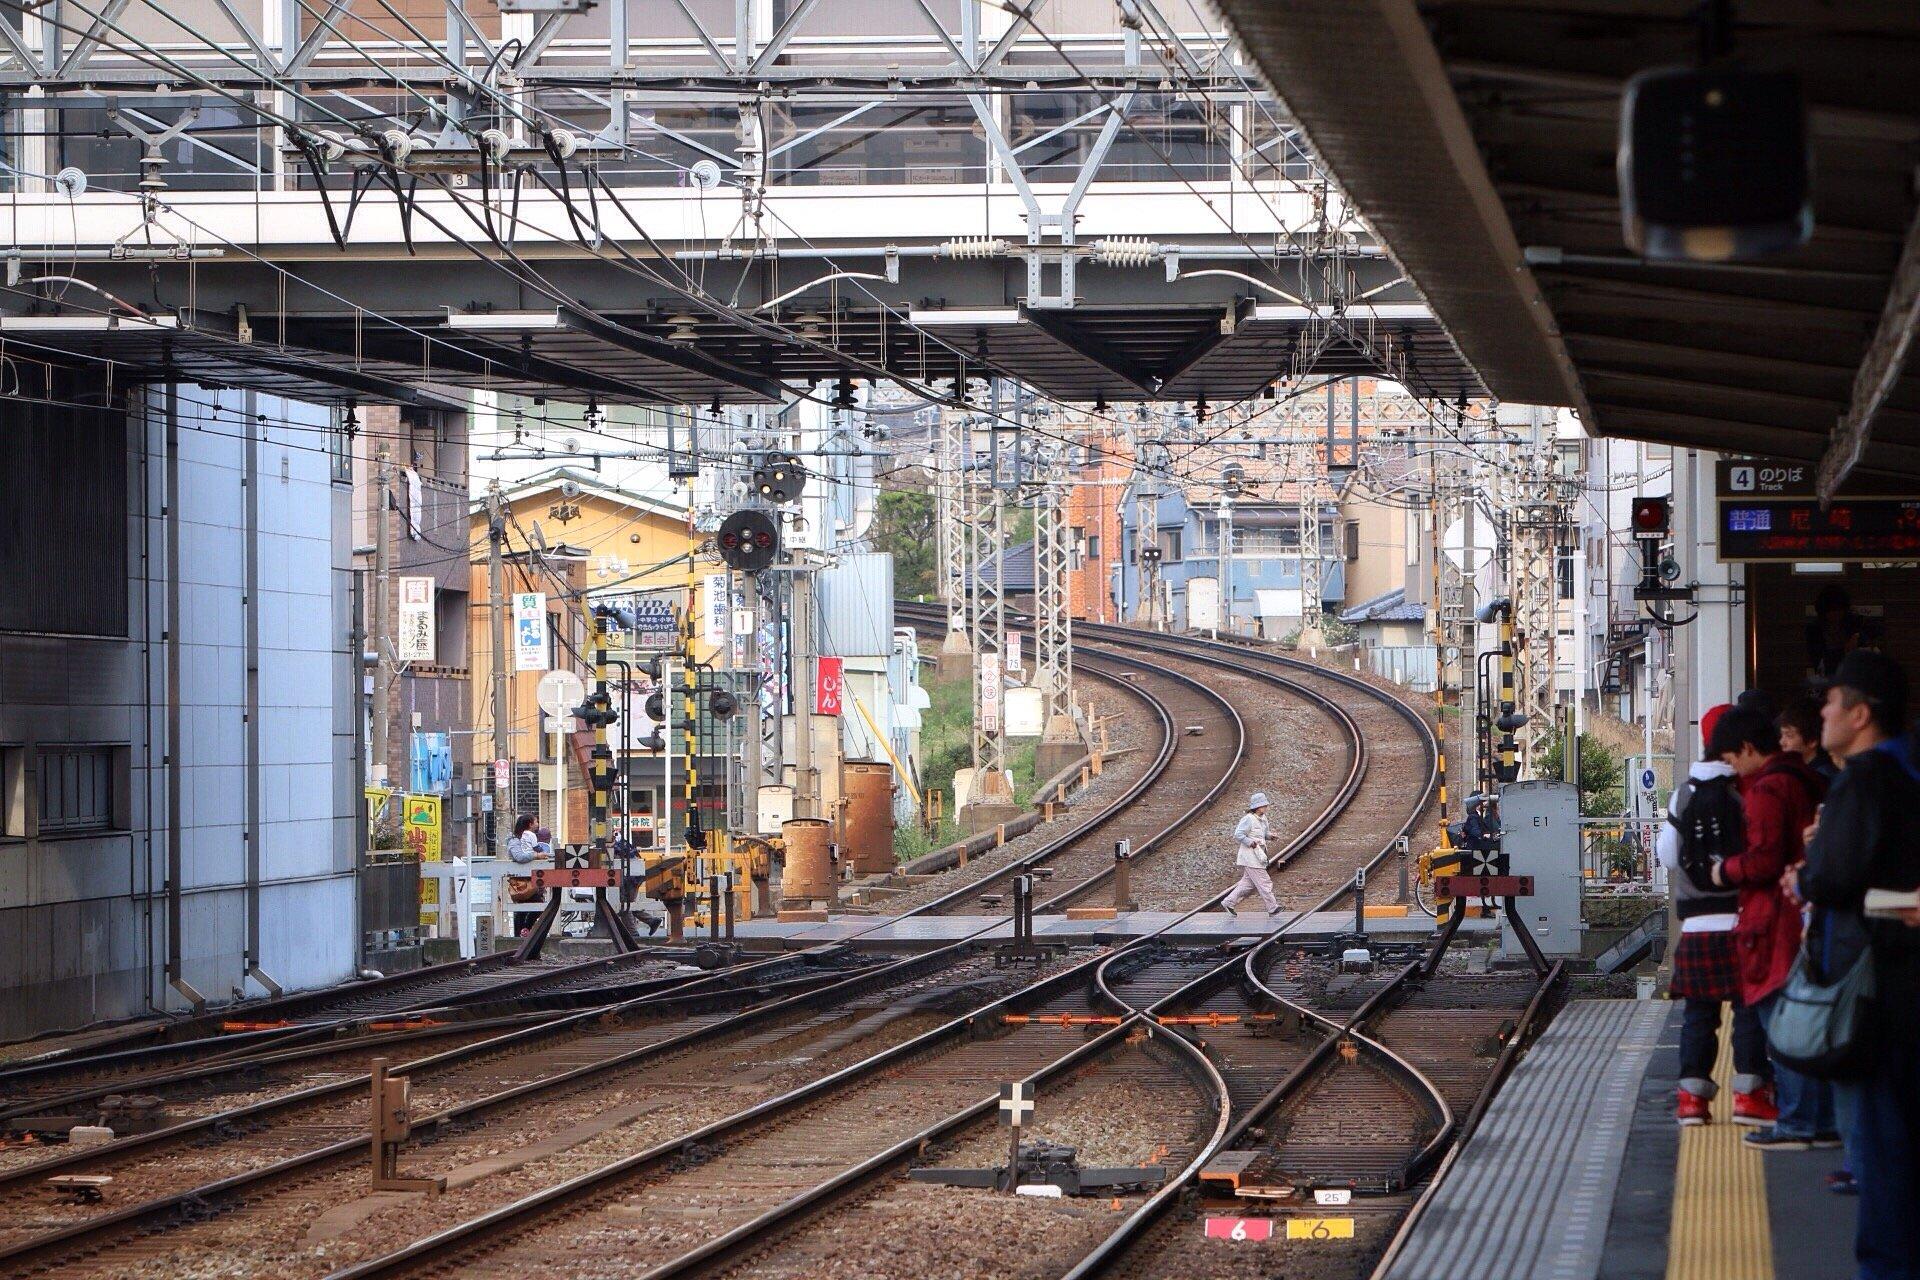 hyotan-yama-station-kasuma-fotografie-blog